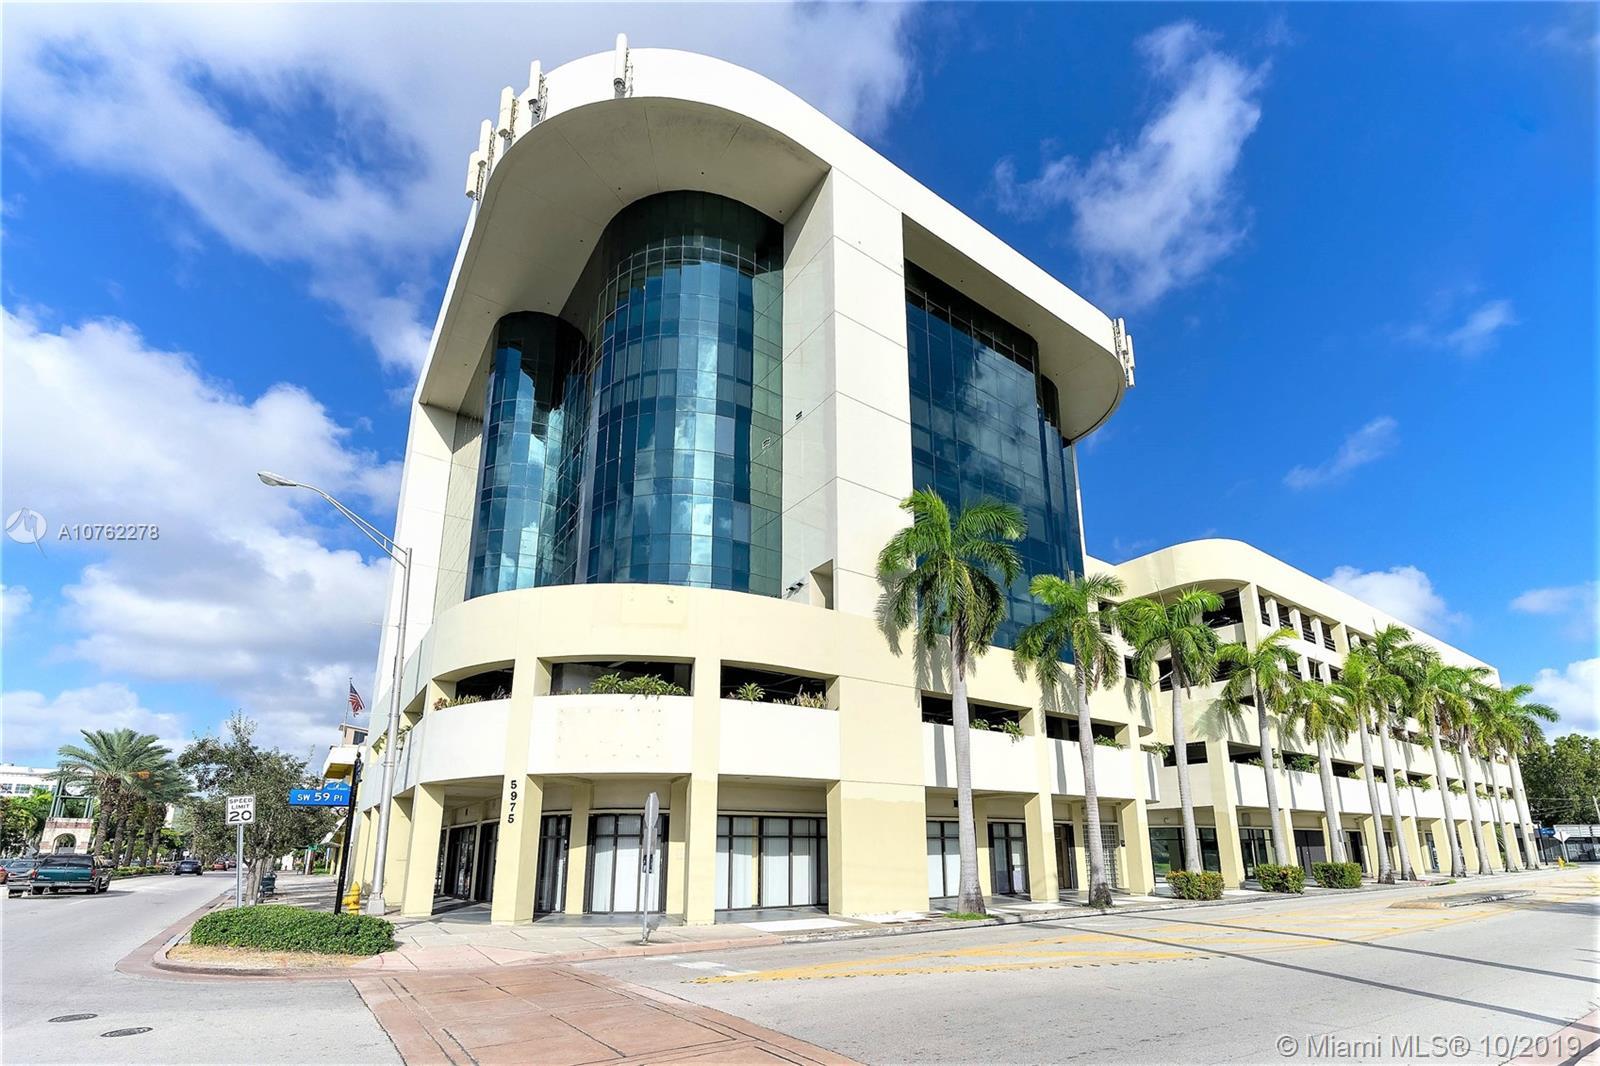 5975 Sunset Dr 100, South Miami, FL 33143